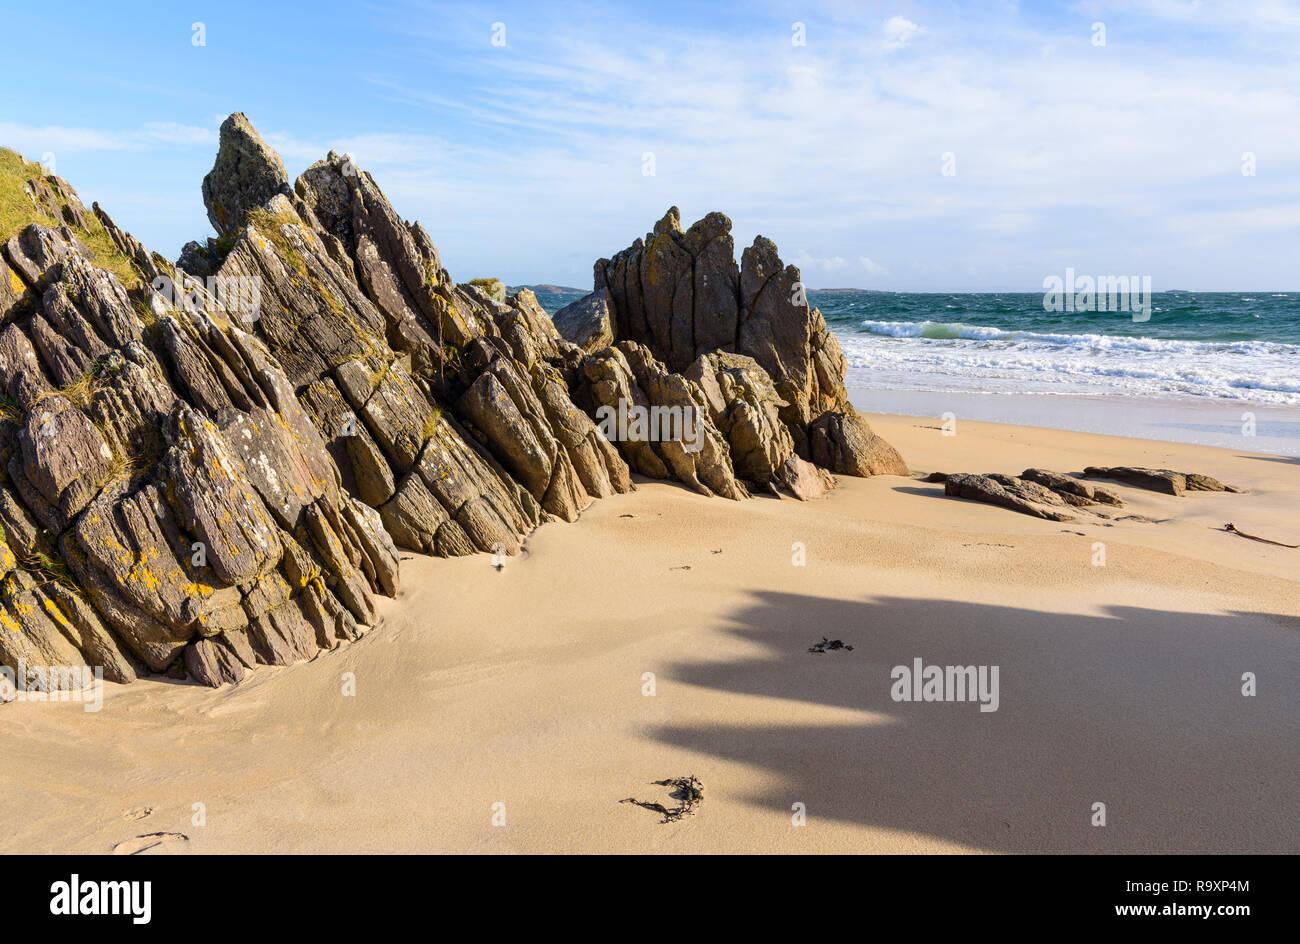 Singing sands of Traigh Bhan beach, near Port Ellen, Islay, Inner Hebrides, Argyll & Bute, Scotland - Stock Image